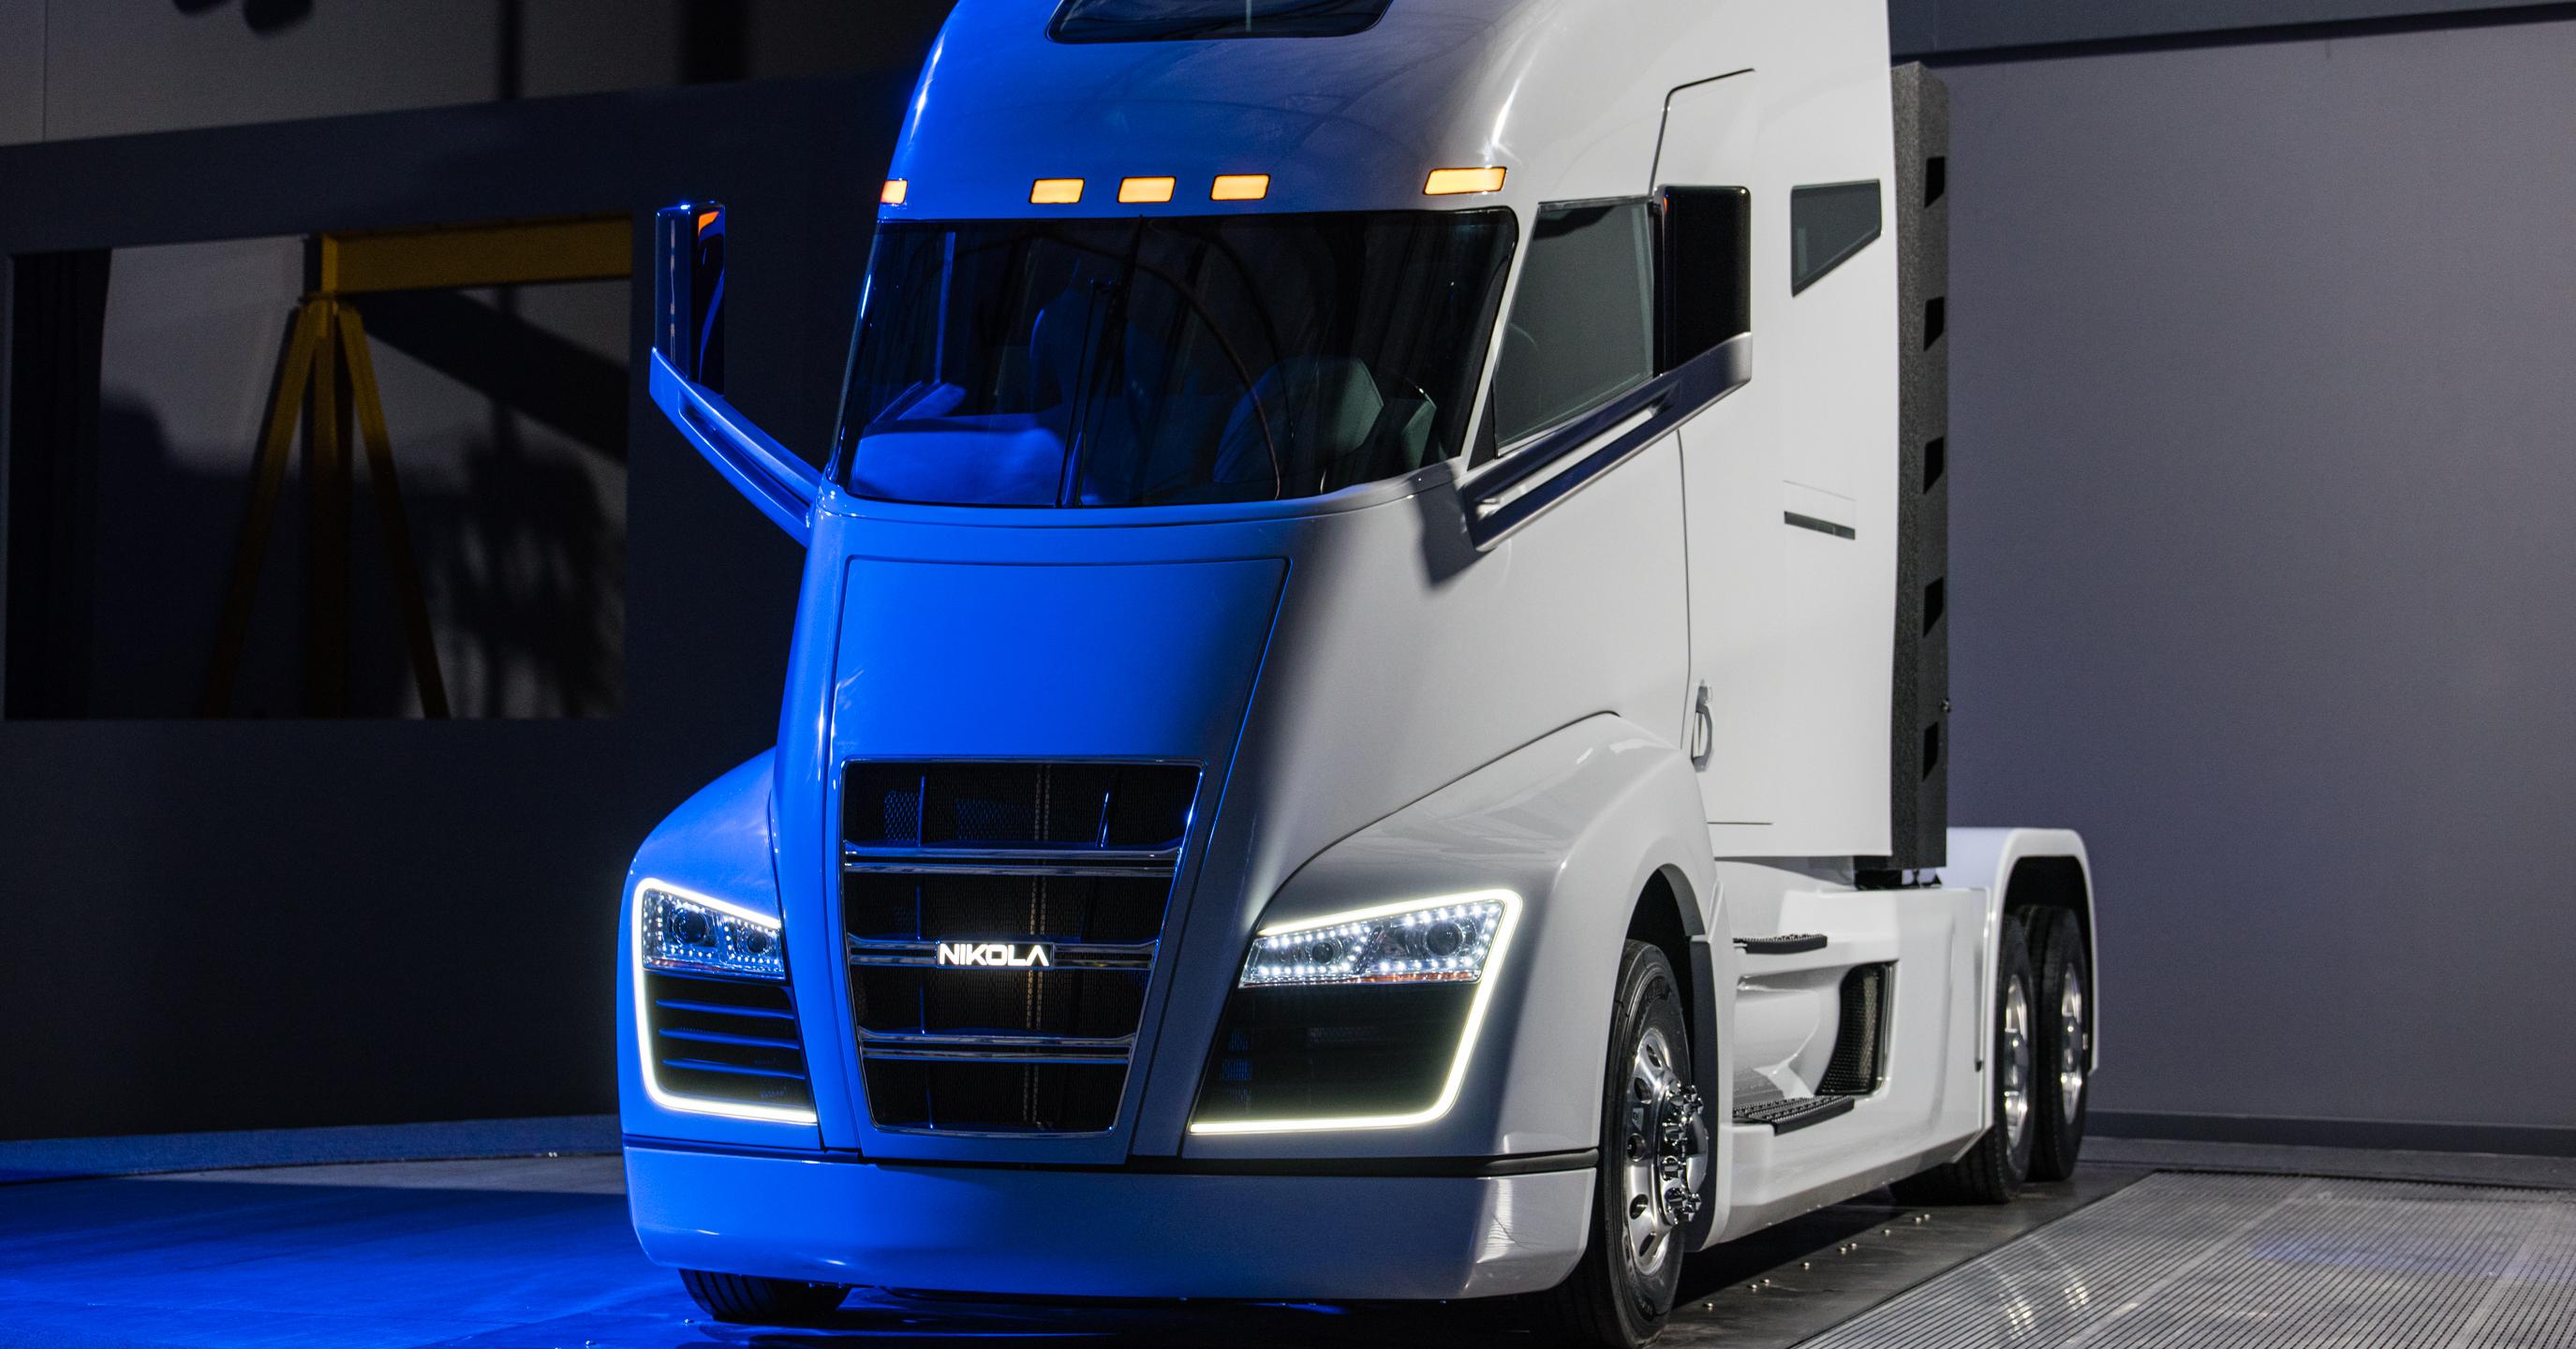 Nikola Reveals Hydrogen Fuel Cell Truck With Range Of 1200 Miles Semi Filter Enlarge